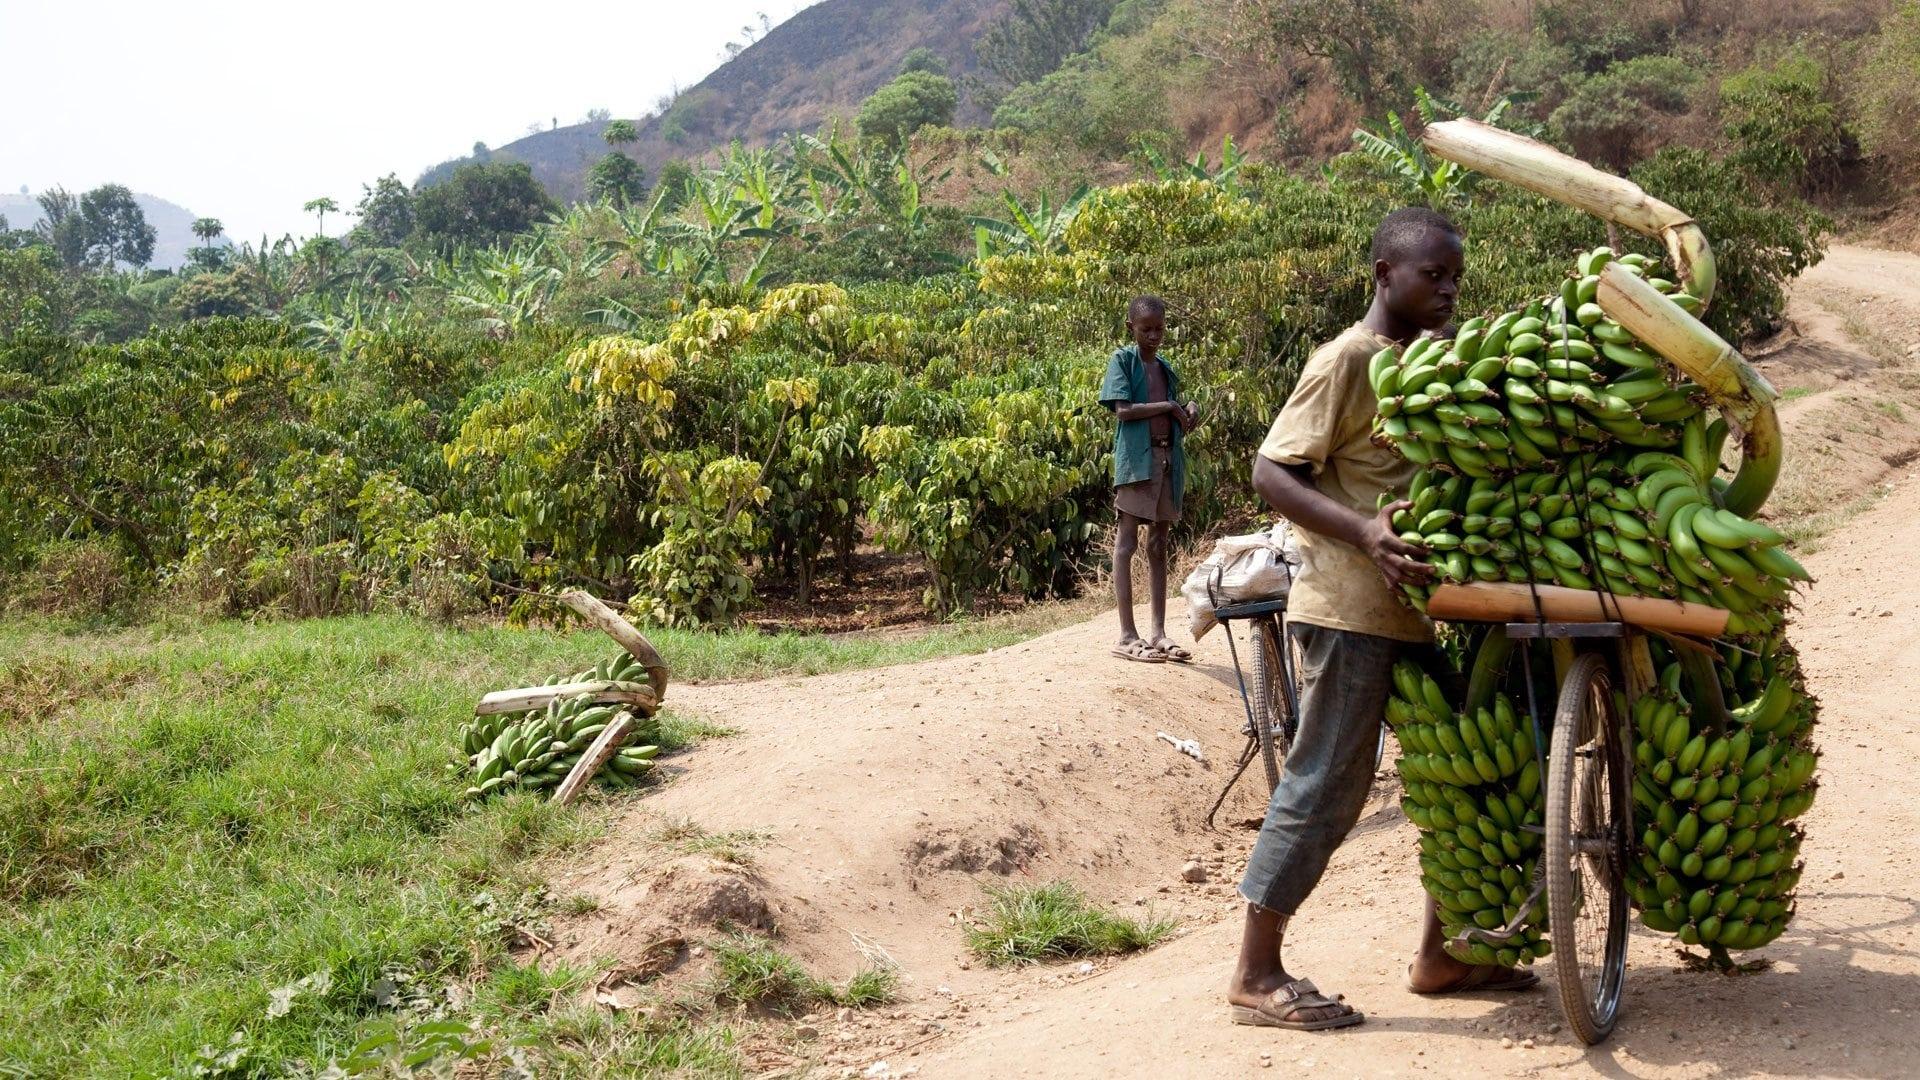 5 Safety Tips for Female Travelers Visiting Uganda